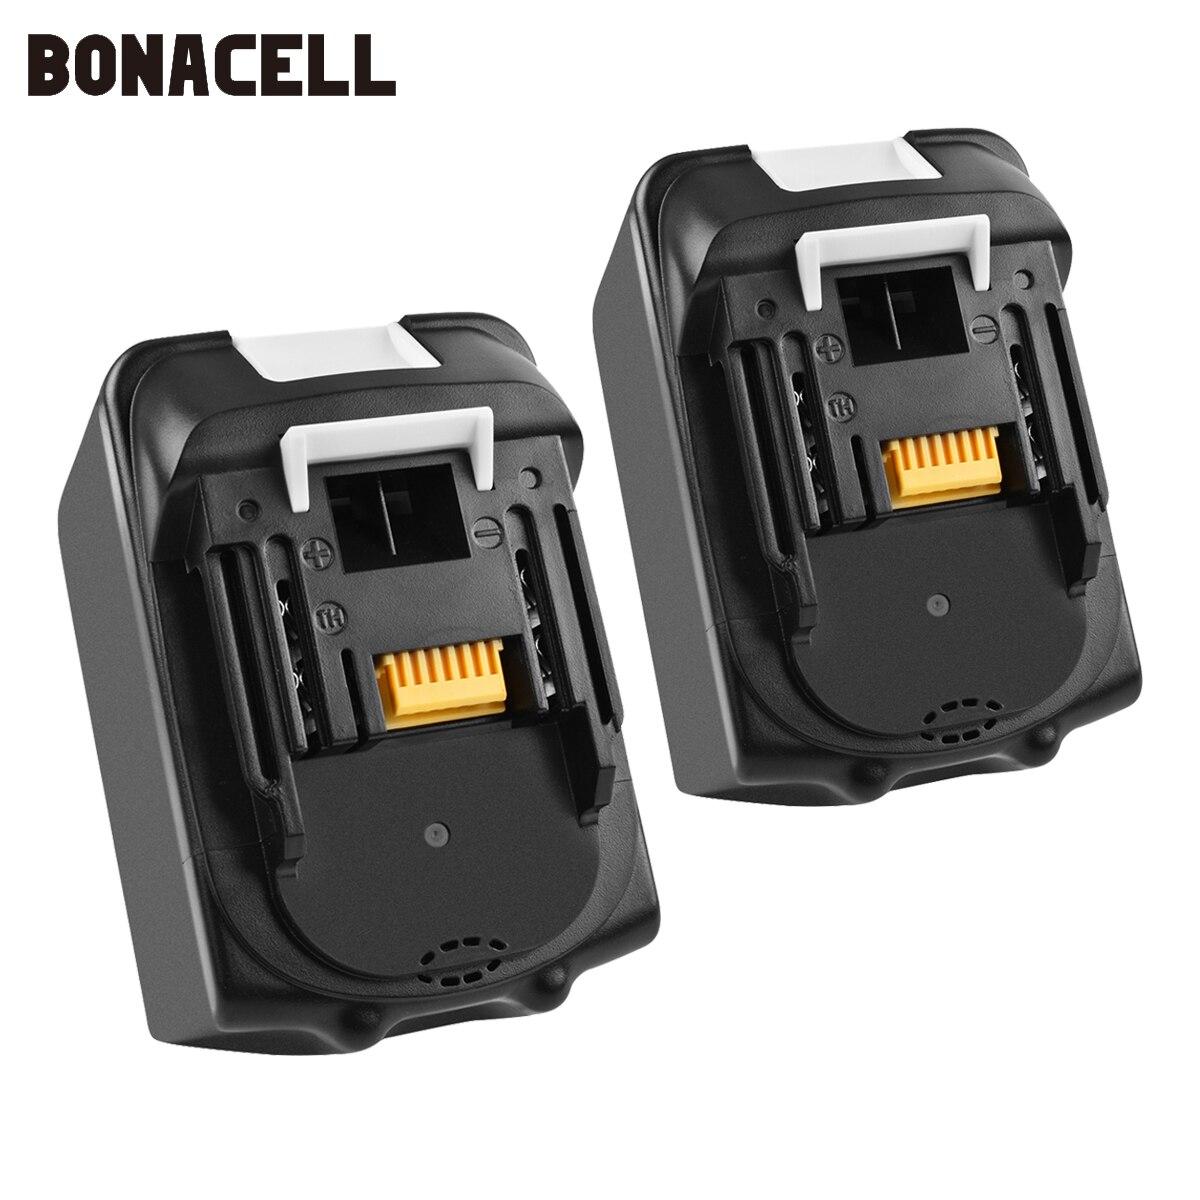 Bonacell 18V 9000mAh BL1830 Lithium Battery Pack Replacement for Makita Drill LXT400 194205-3 194309-1 BL1815 BL1840 BL1850 L30Bonacell 18V 9000mAh BL1830 Lithium Battery Pack Replacement for Makita Drill LXT400 194205-3 194309-1 BL1815 BL1840 BL1850 L30